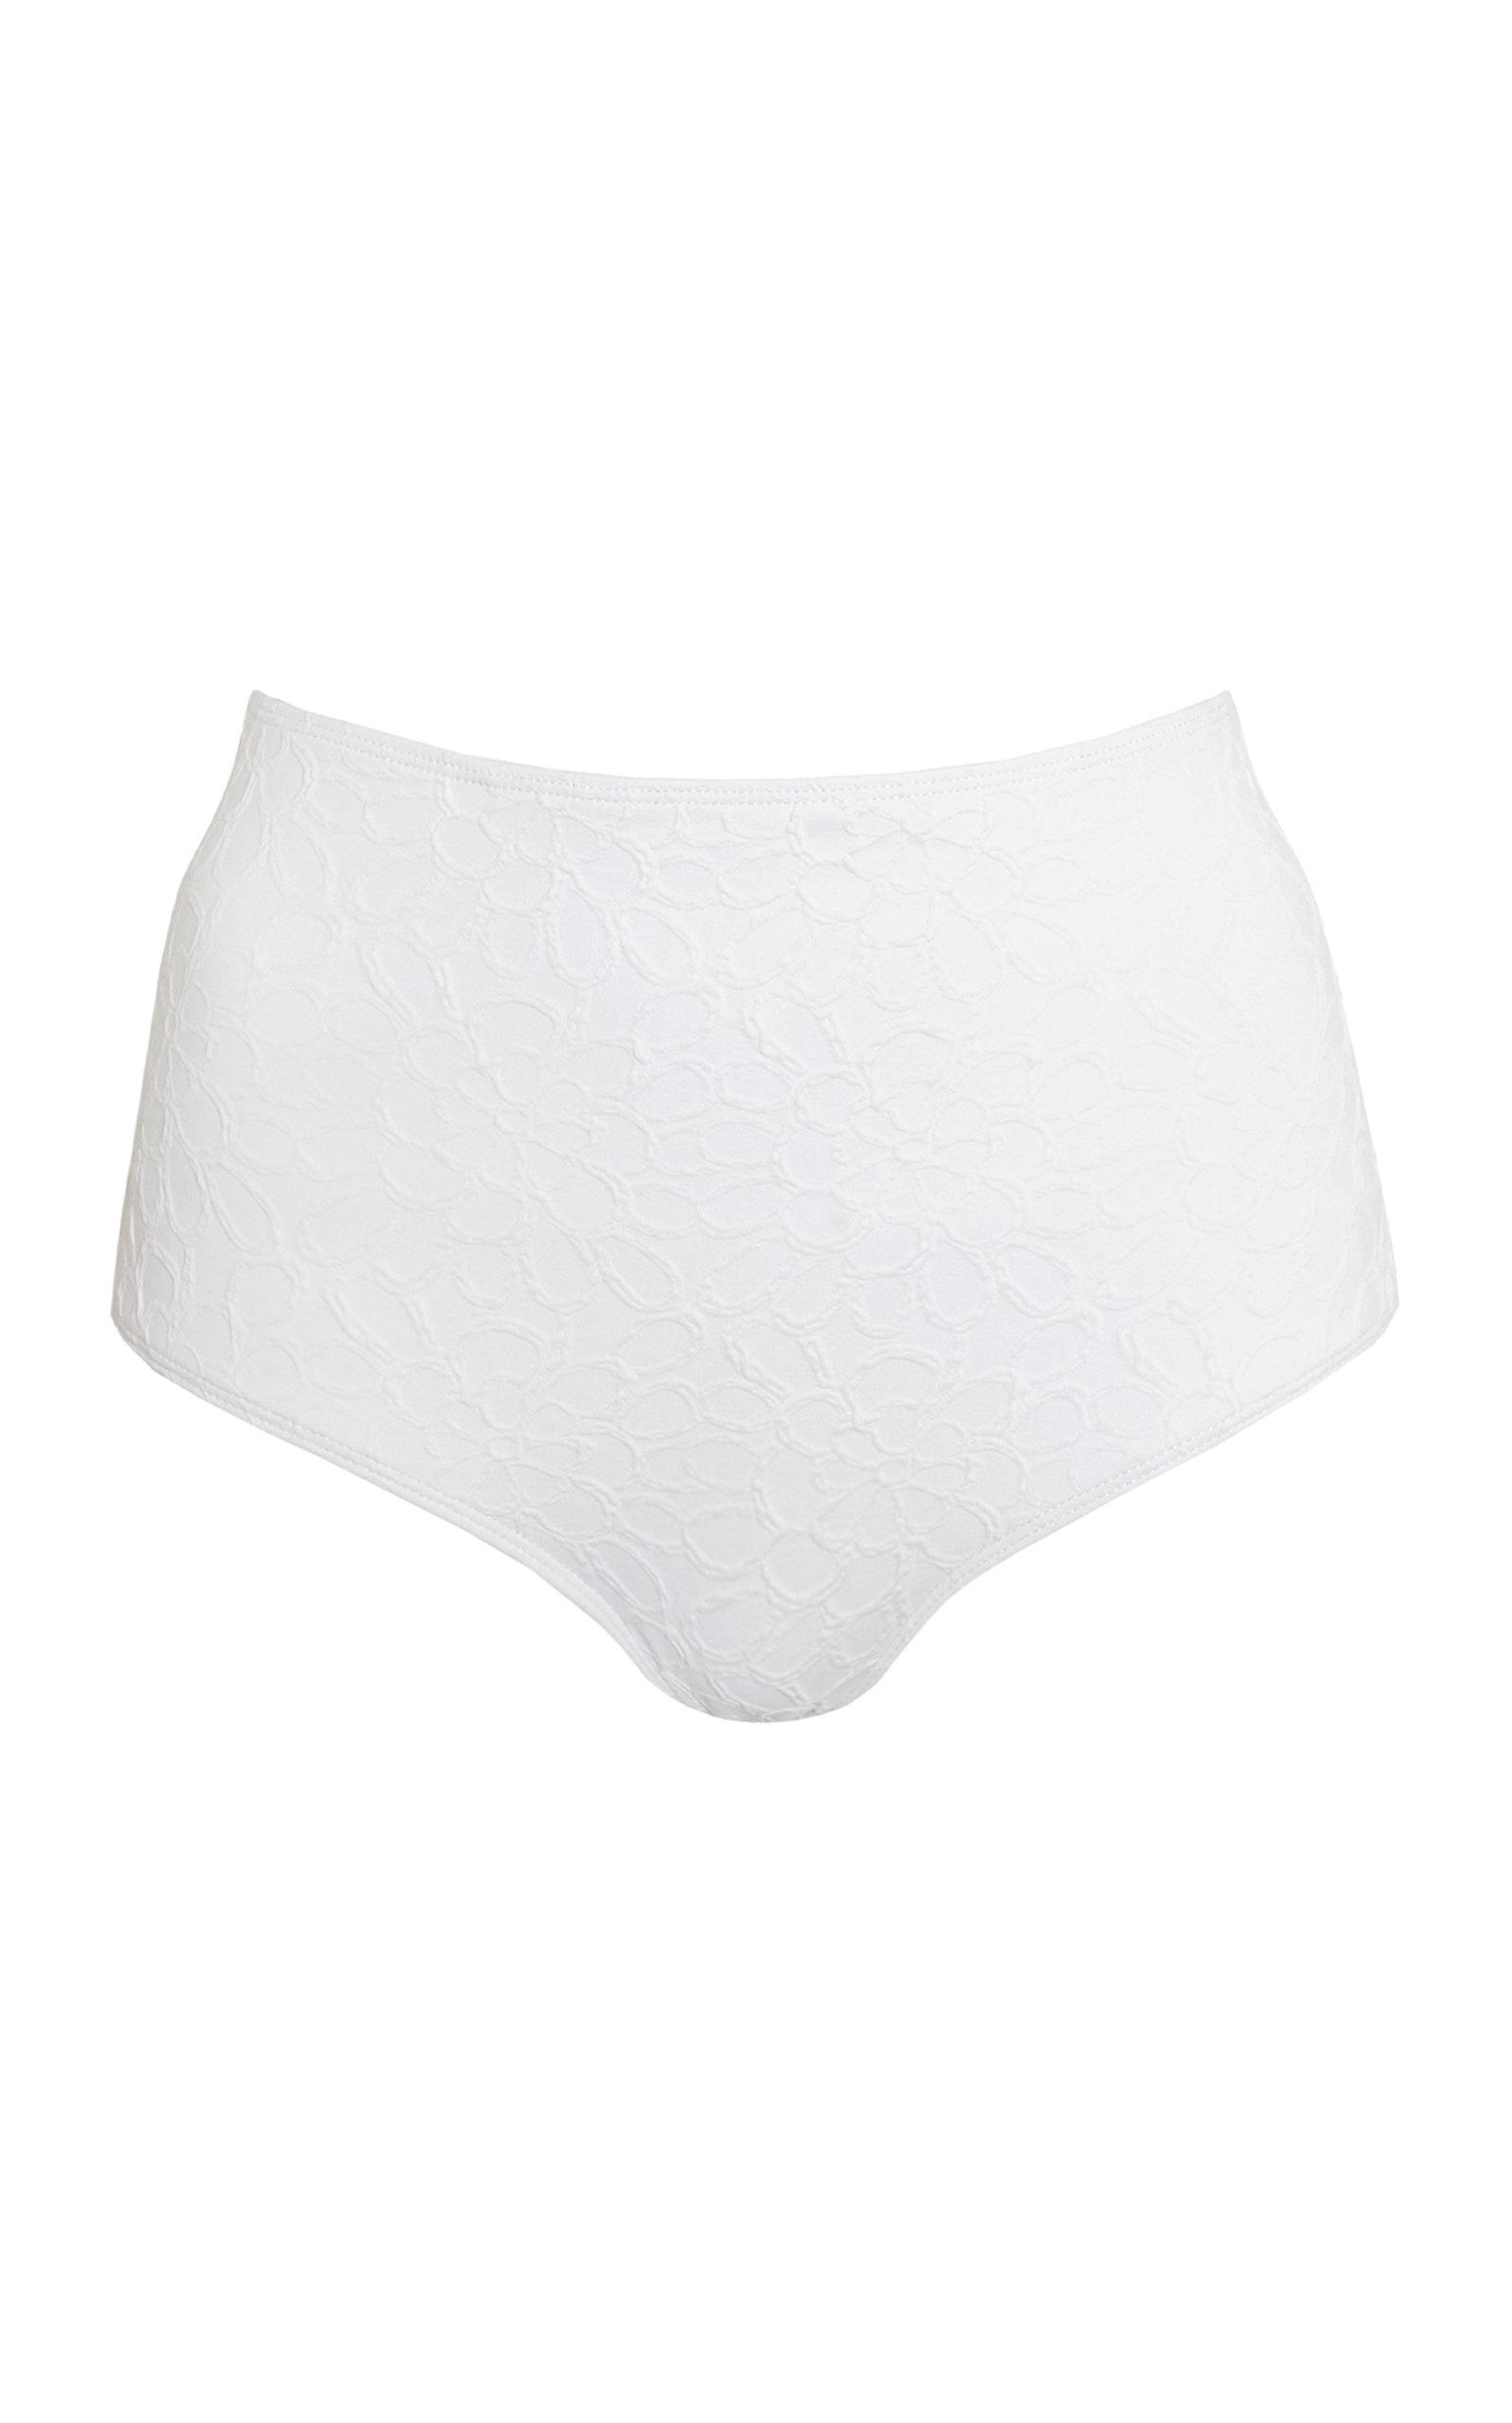 Women's Marina Textured Bikini Bottom